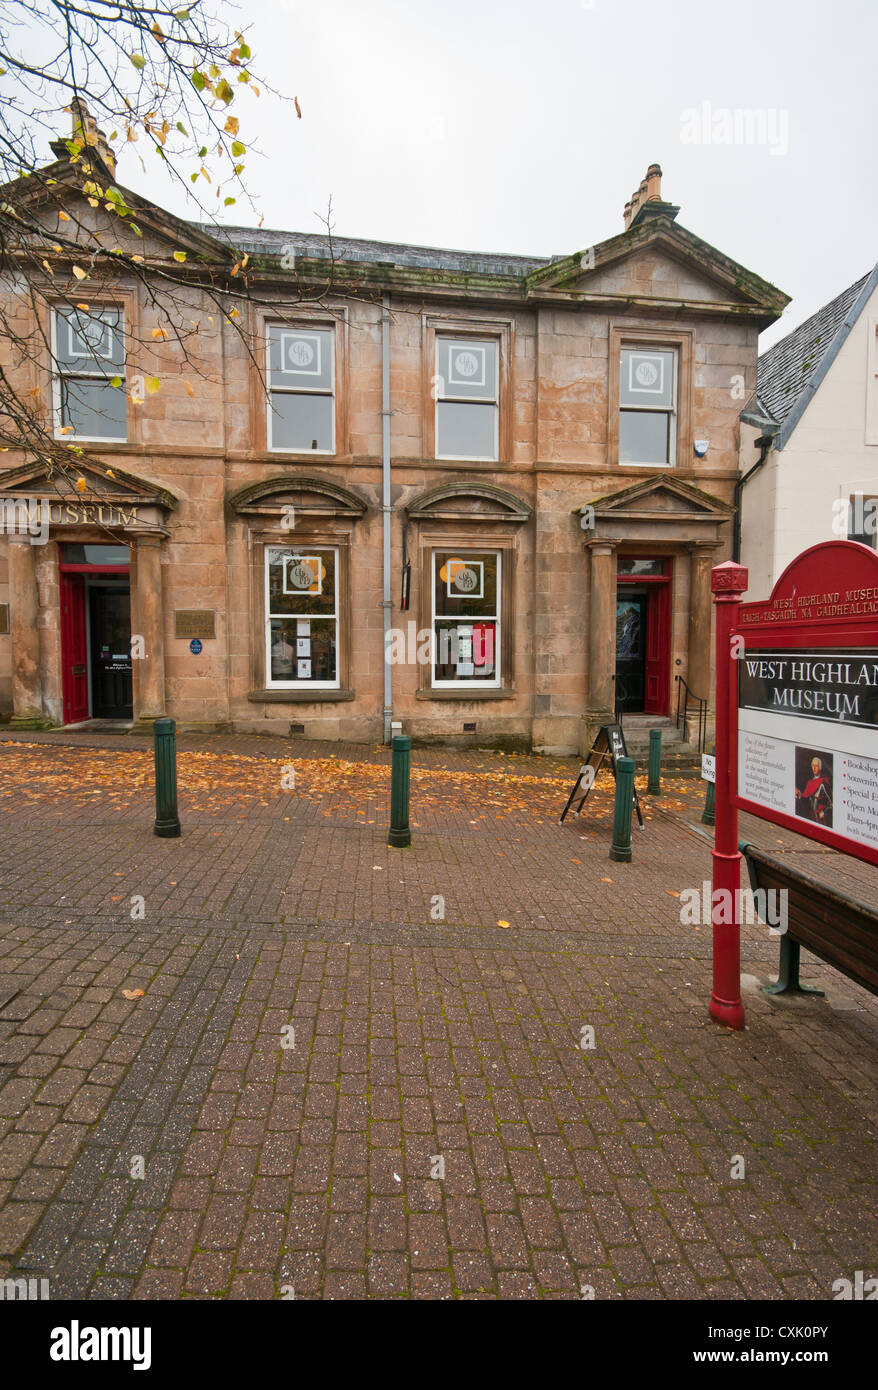 The West Highland Museum Cameron Square Fort William Highland Scotland Stock Photo